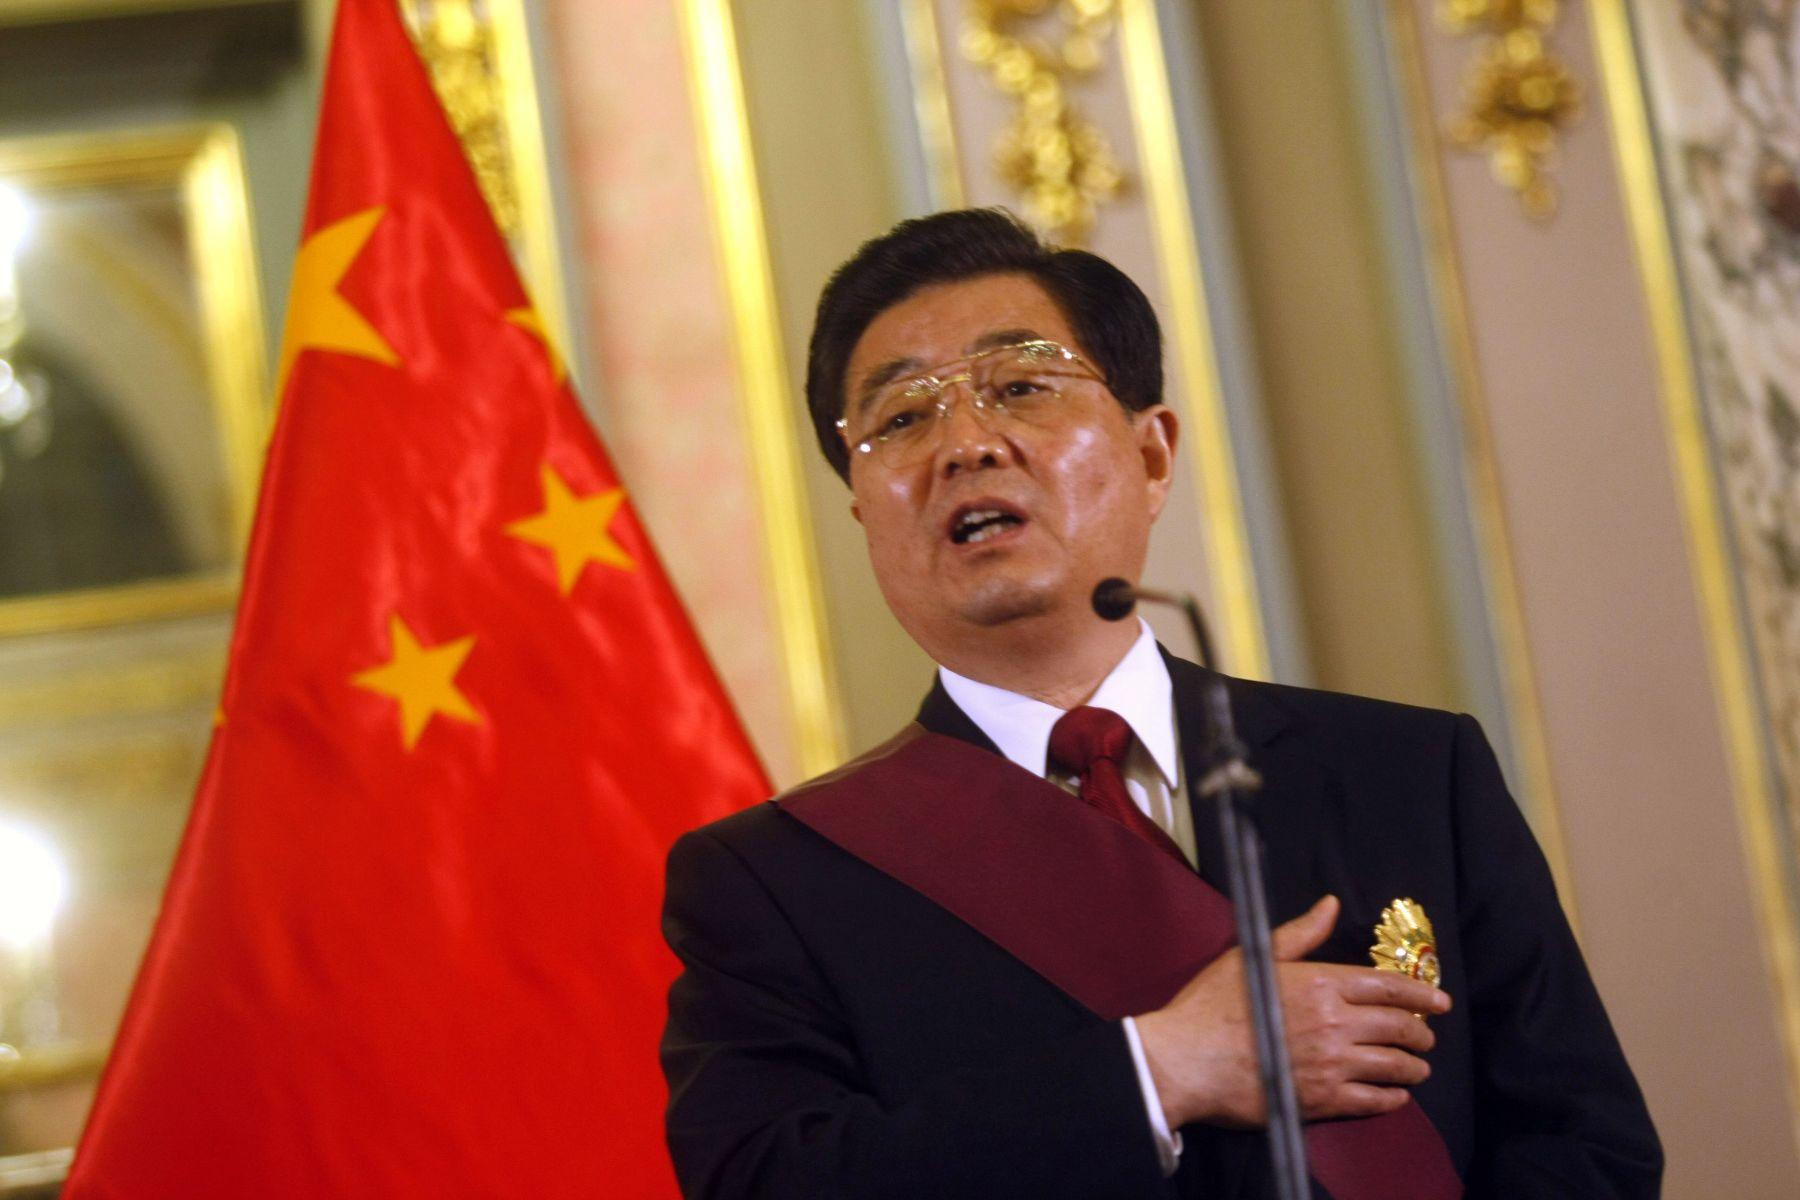 China Peru Exchange Greetings On Anniversary Of Diplomatic Ties